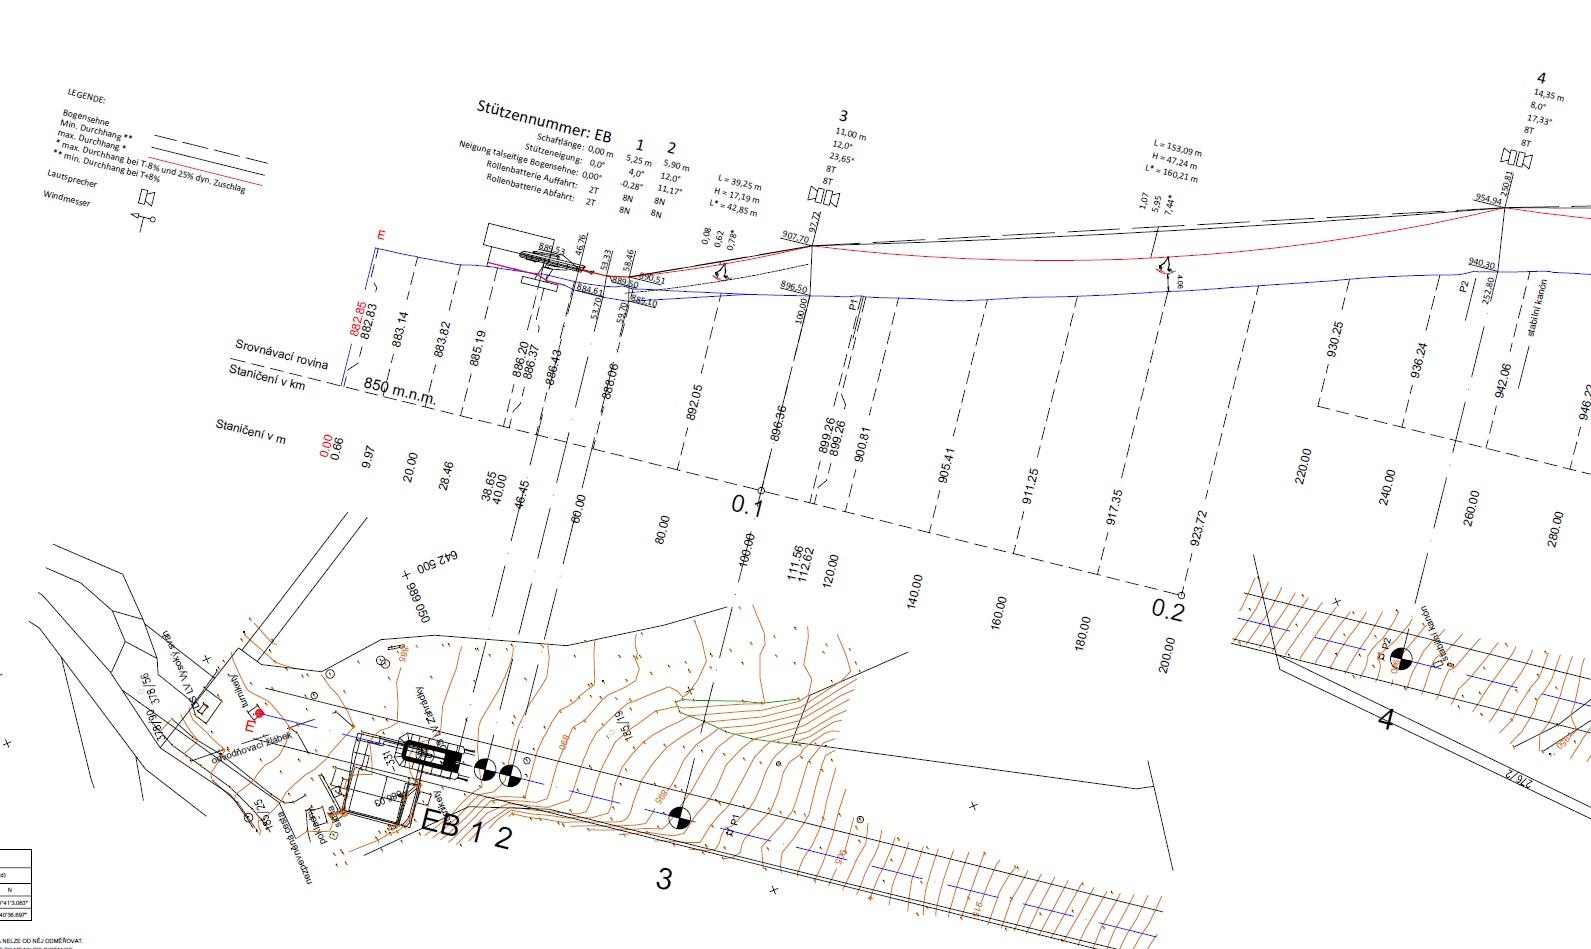 1591x949 Services Masterplanning, Traffic Planning, Ropeway Engineering Rop